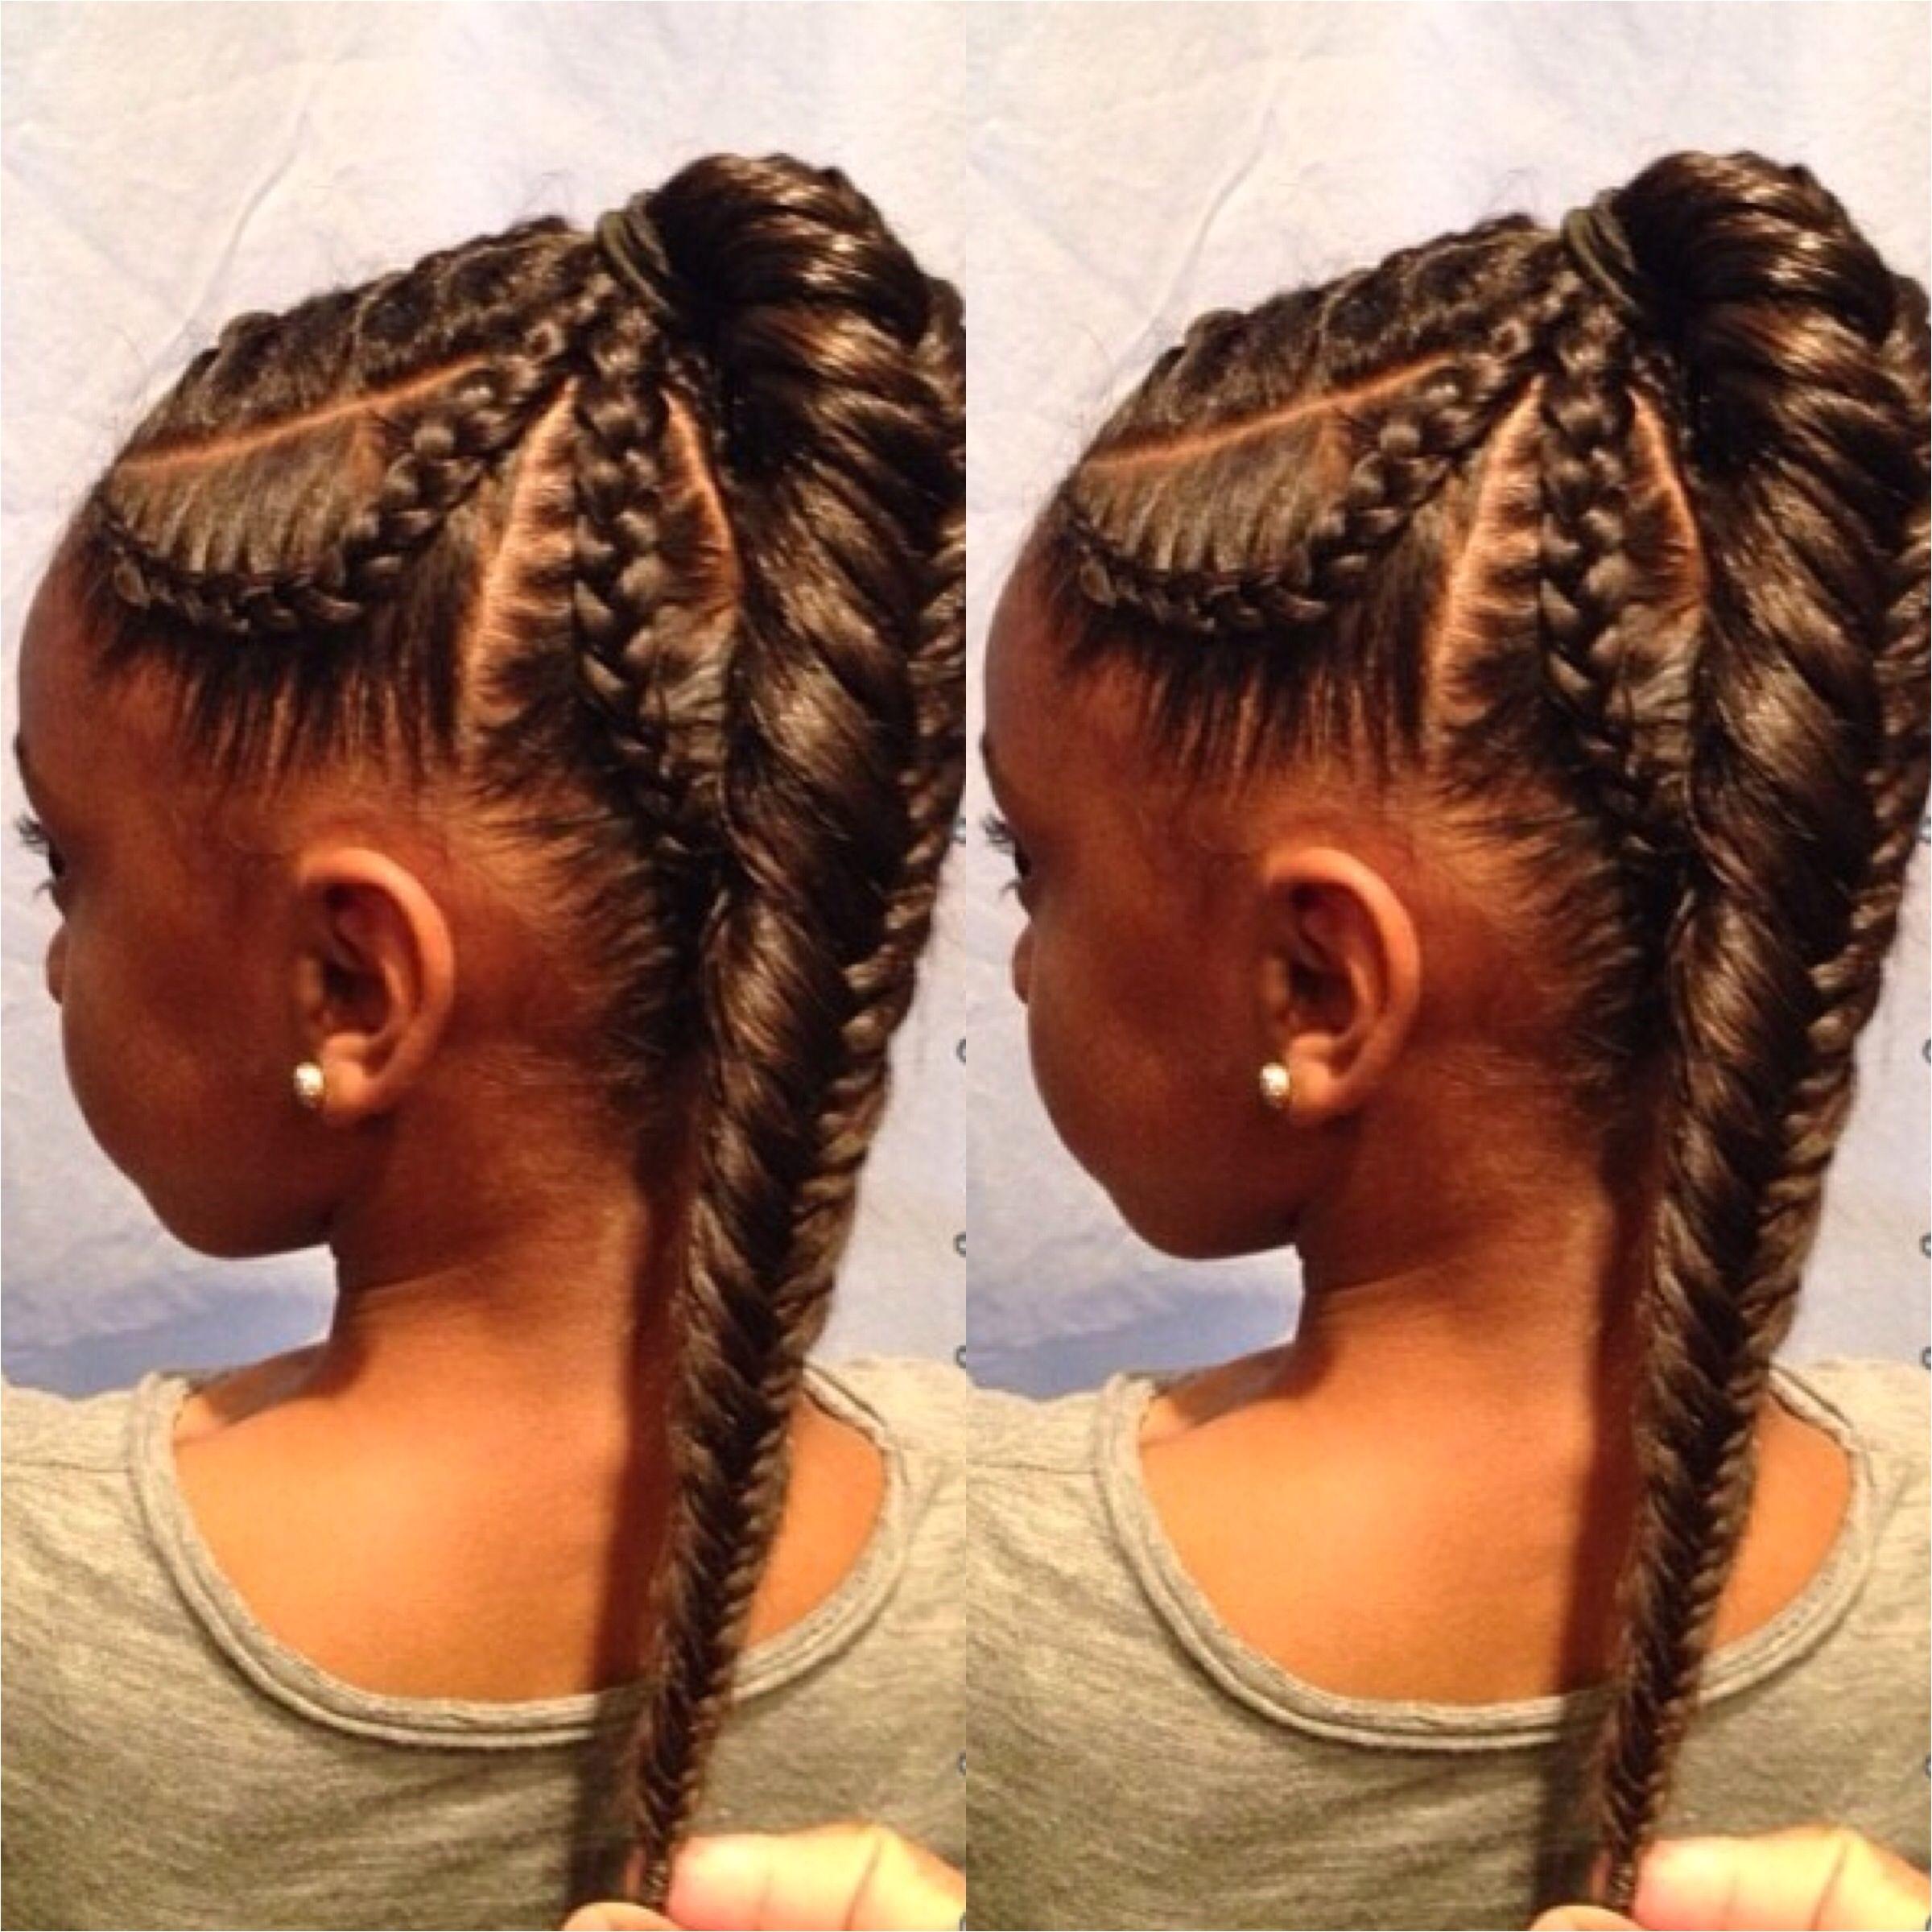 5 braid cornrow fishtail ponytail Black girl hairstyles